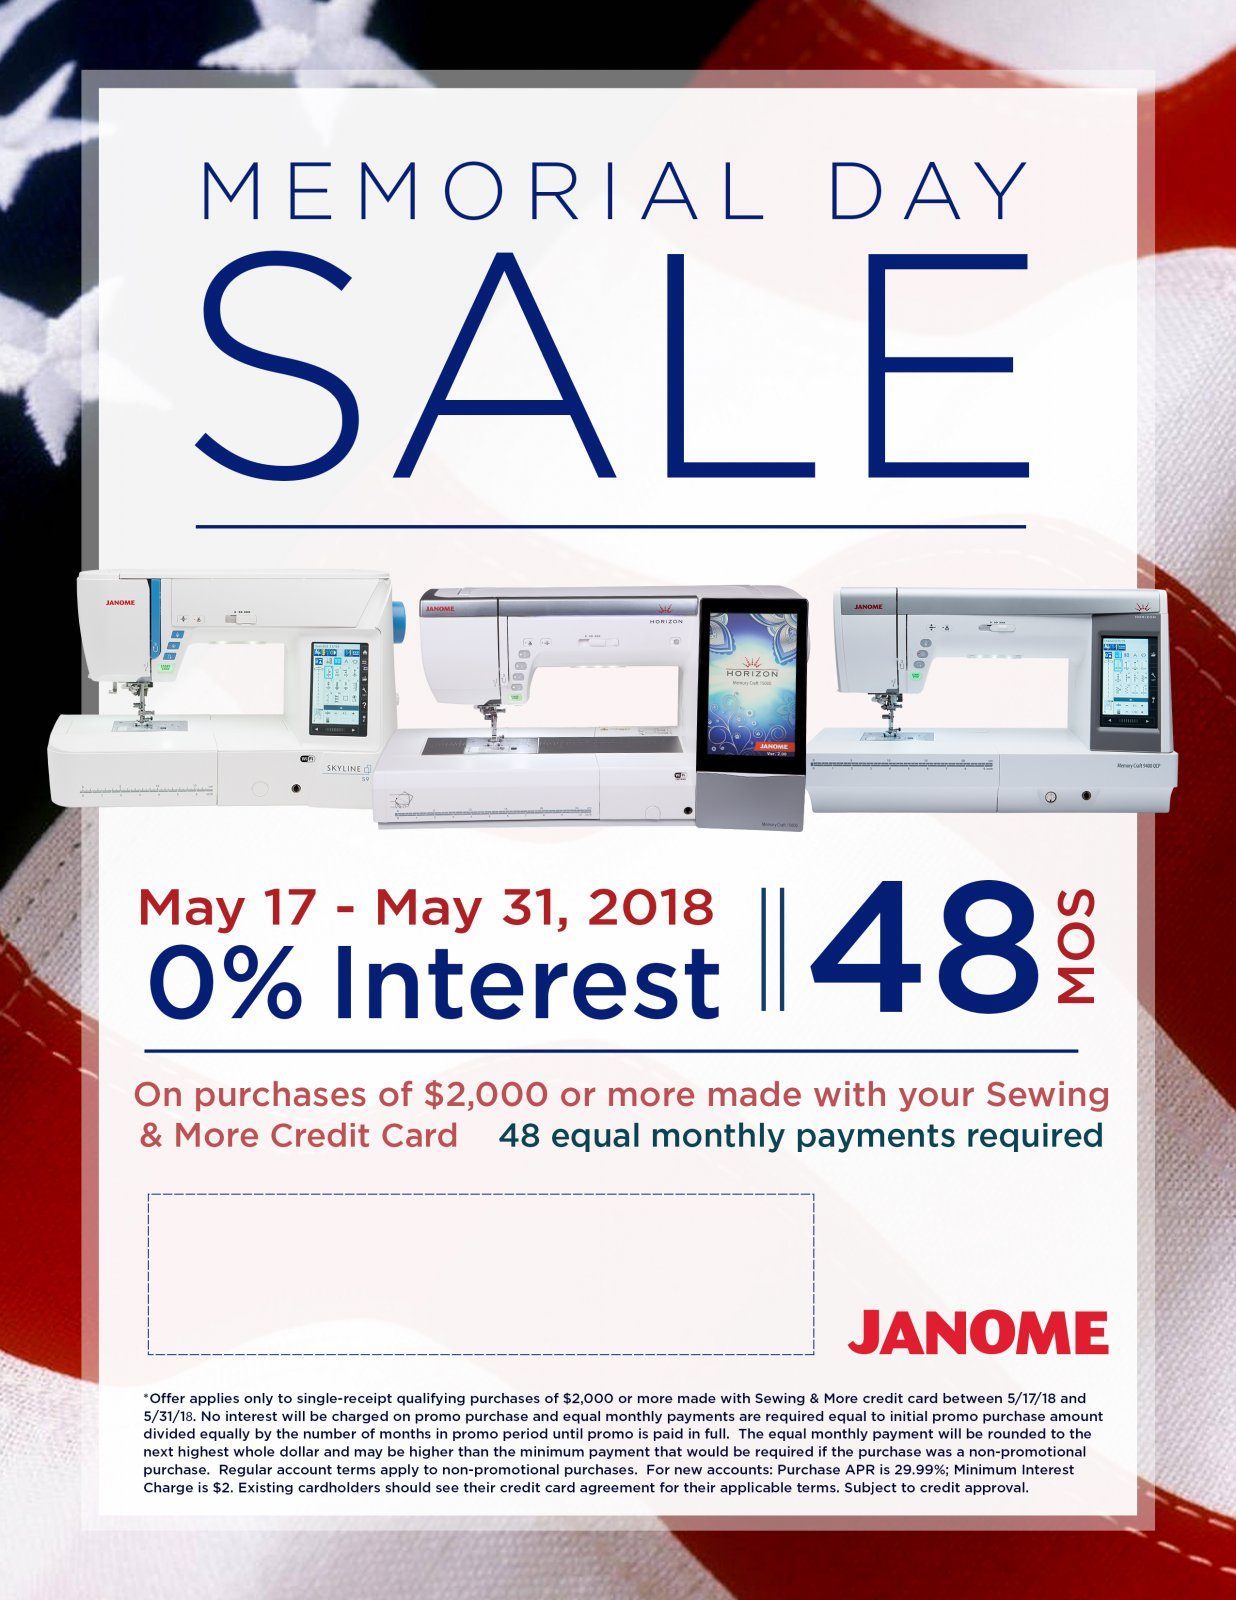 Janome Memorial Day Sale